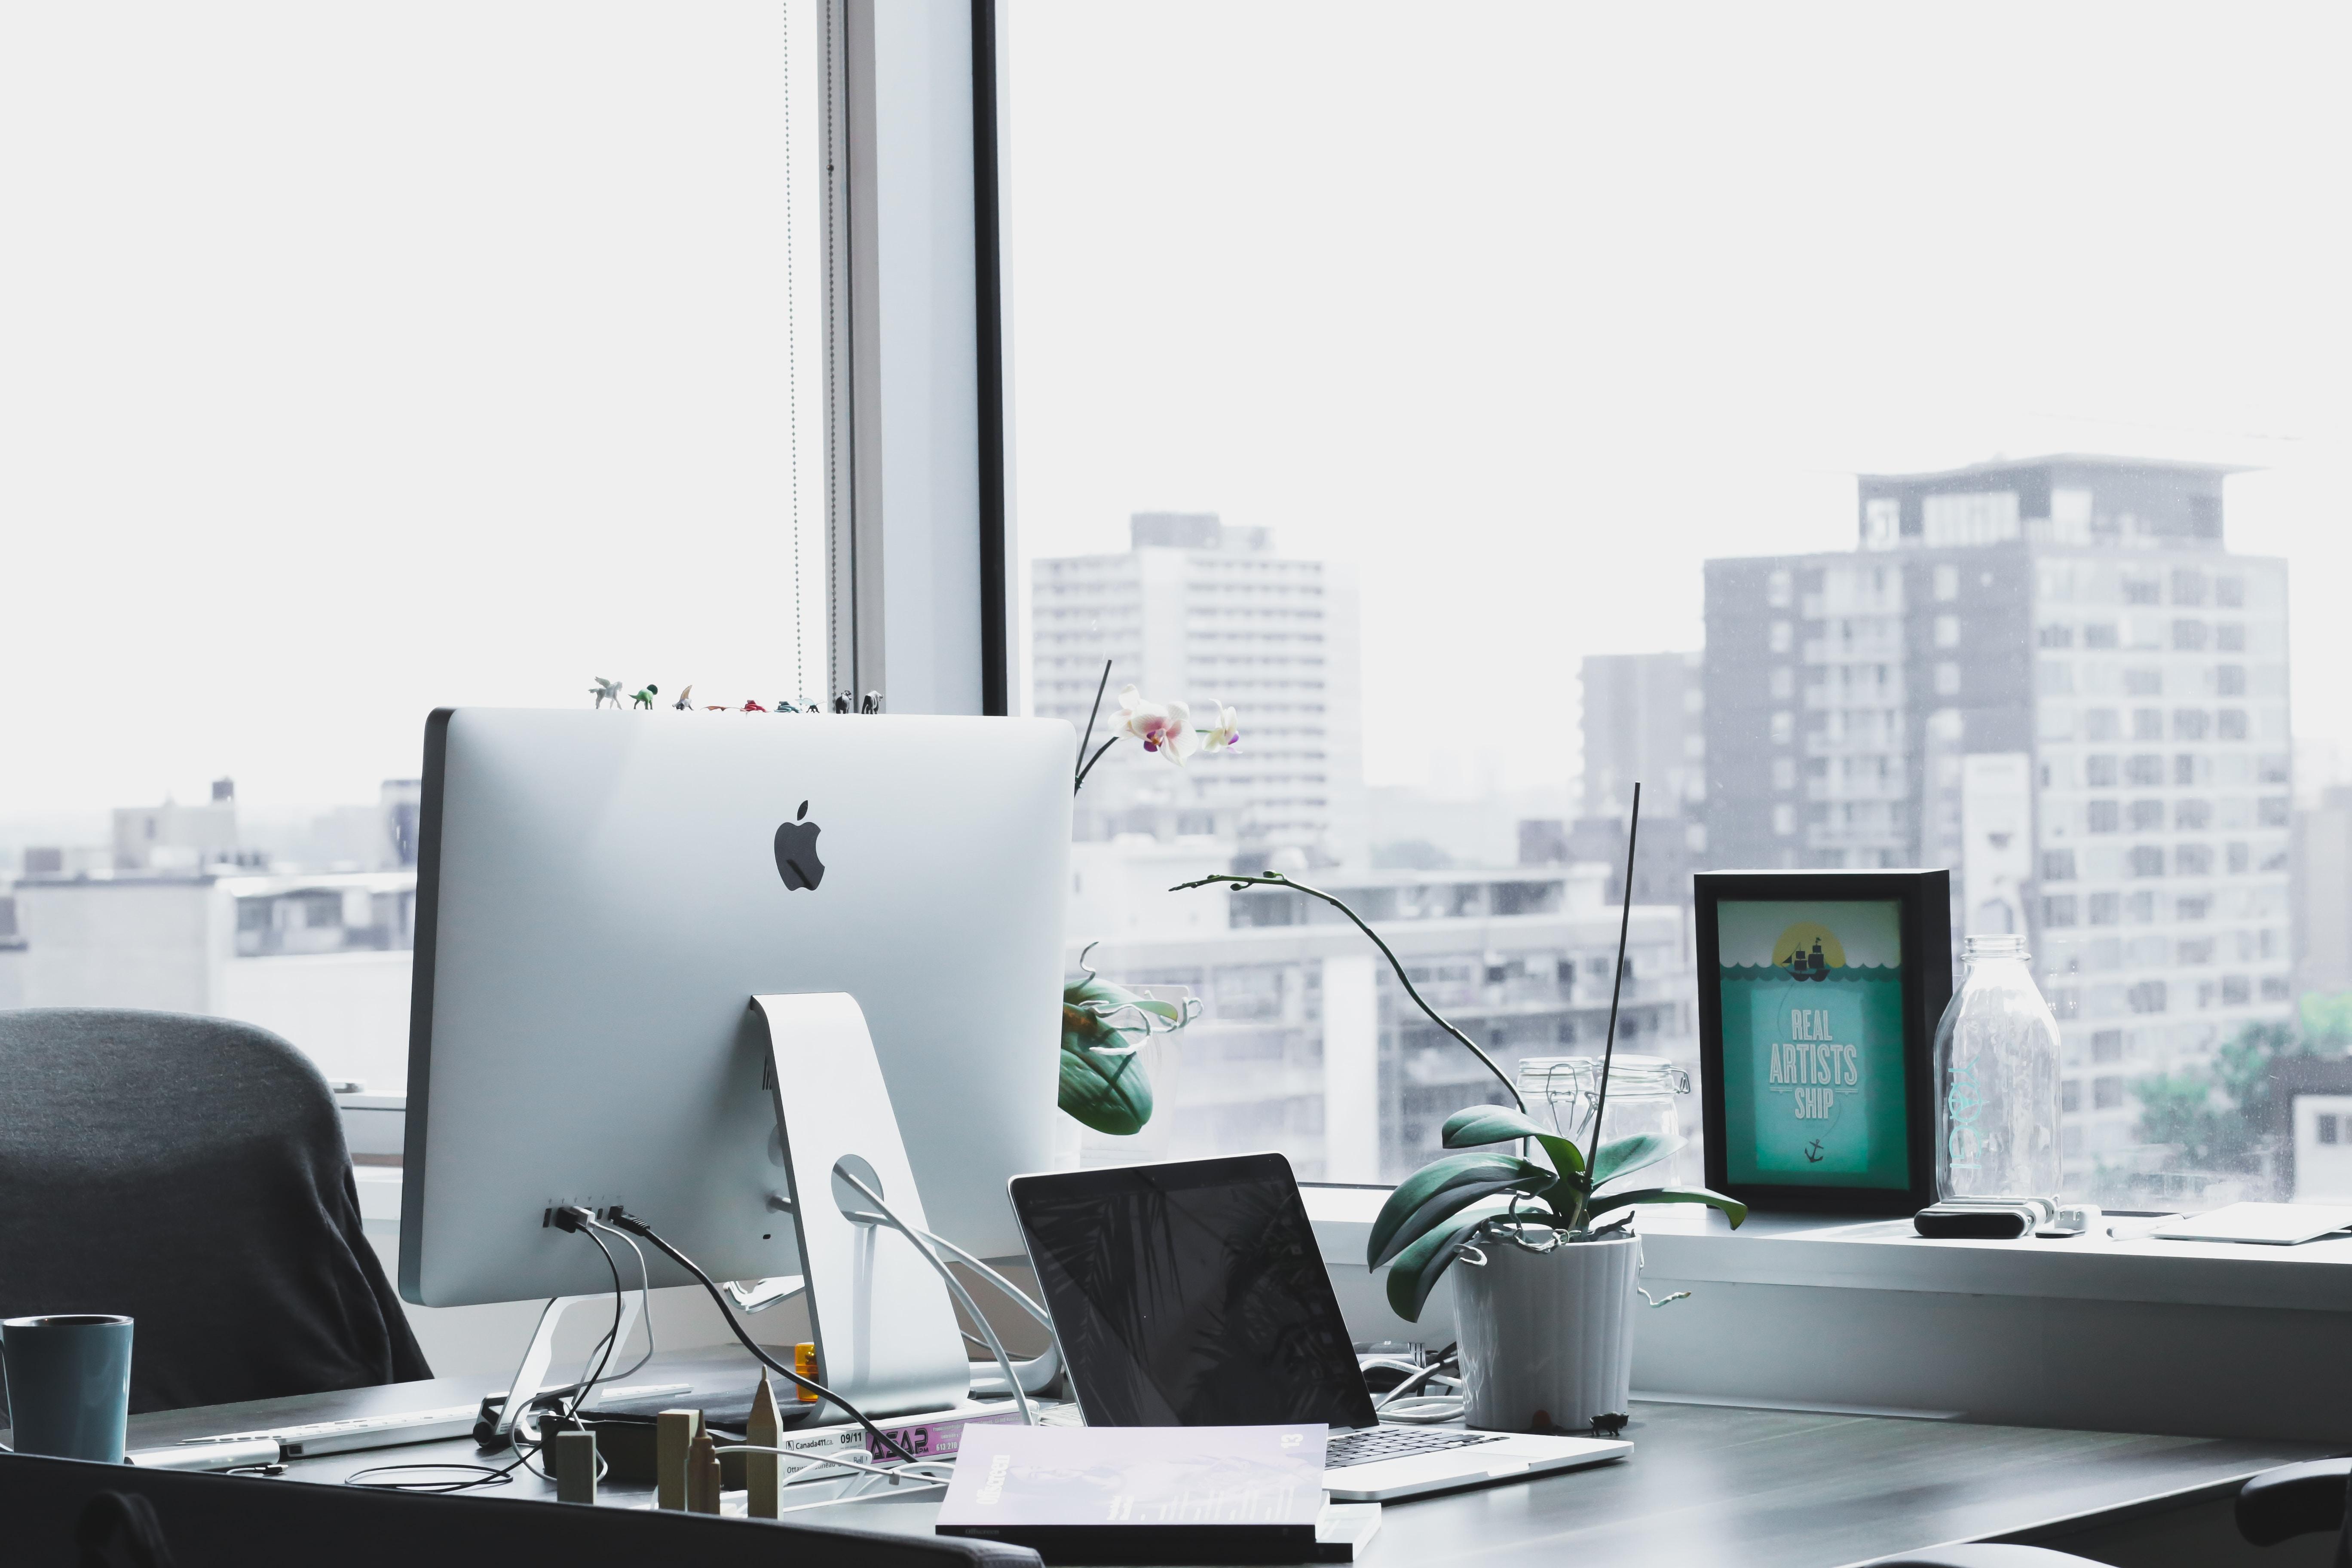 broker-dealer-office-operations-team-coo-new-york-city-brokerage-velox-clearing